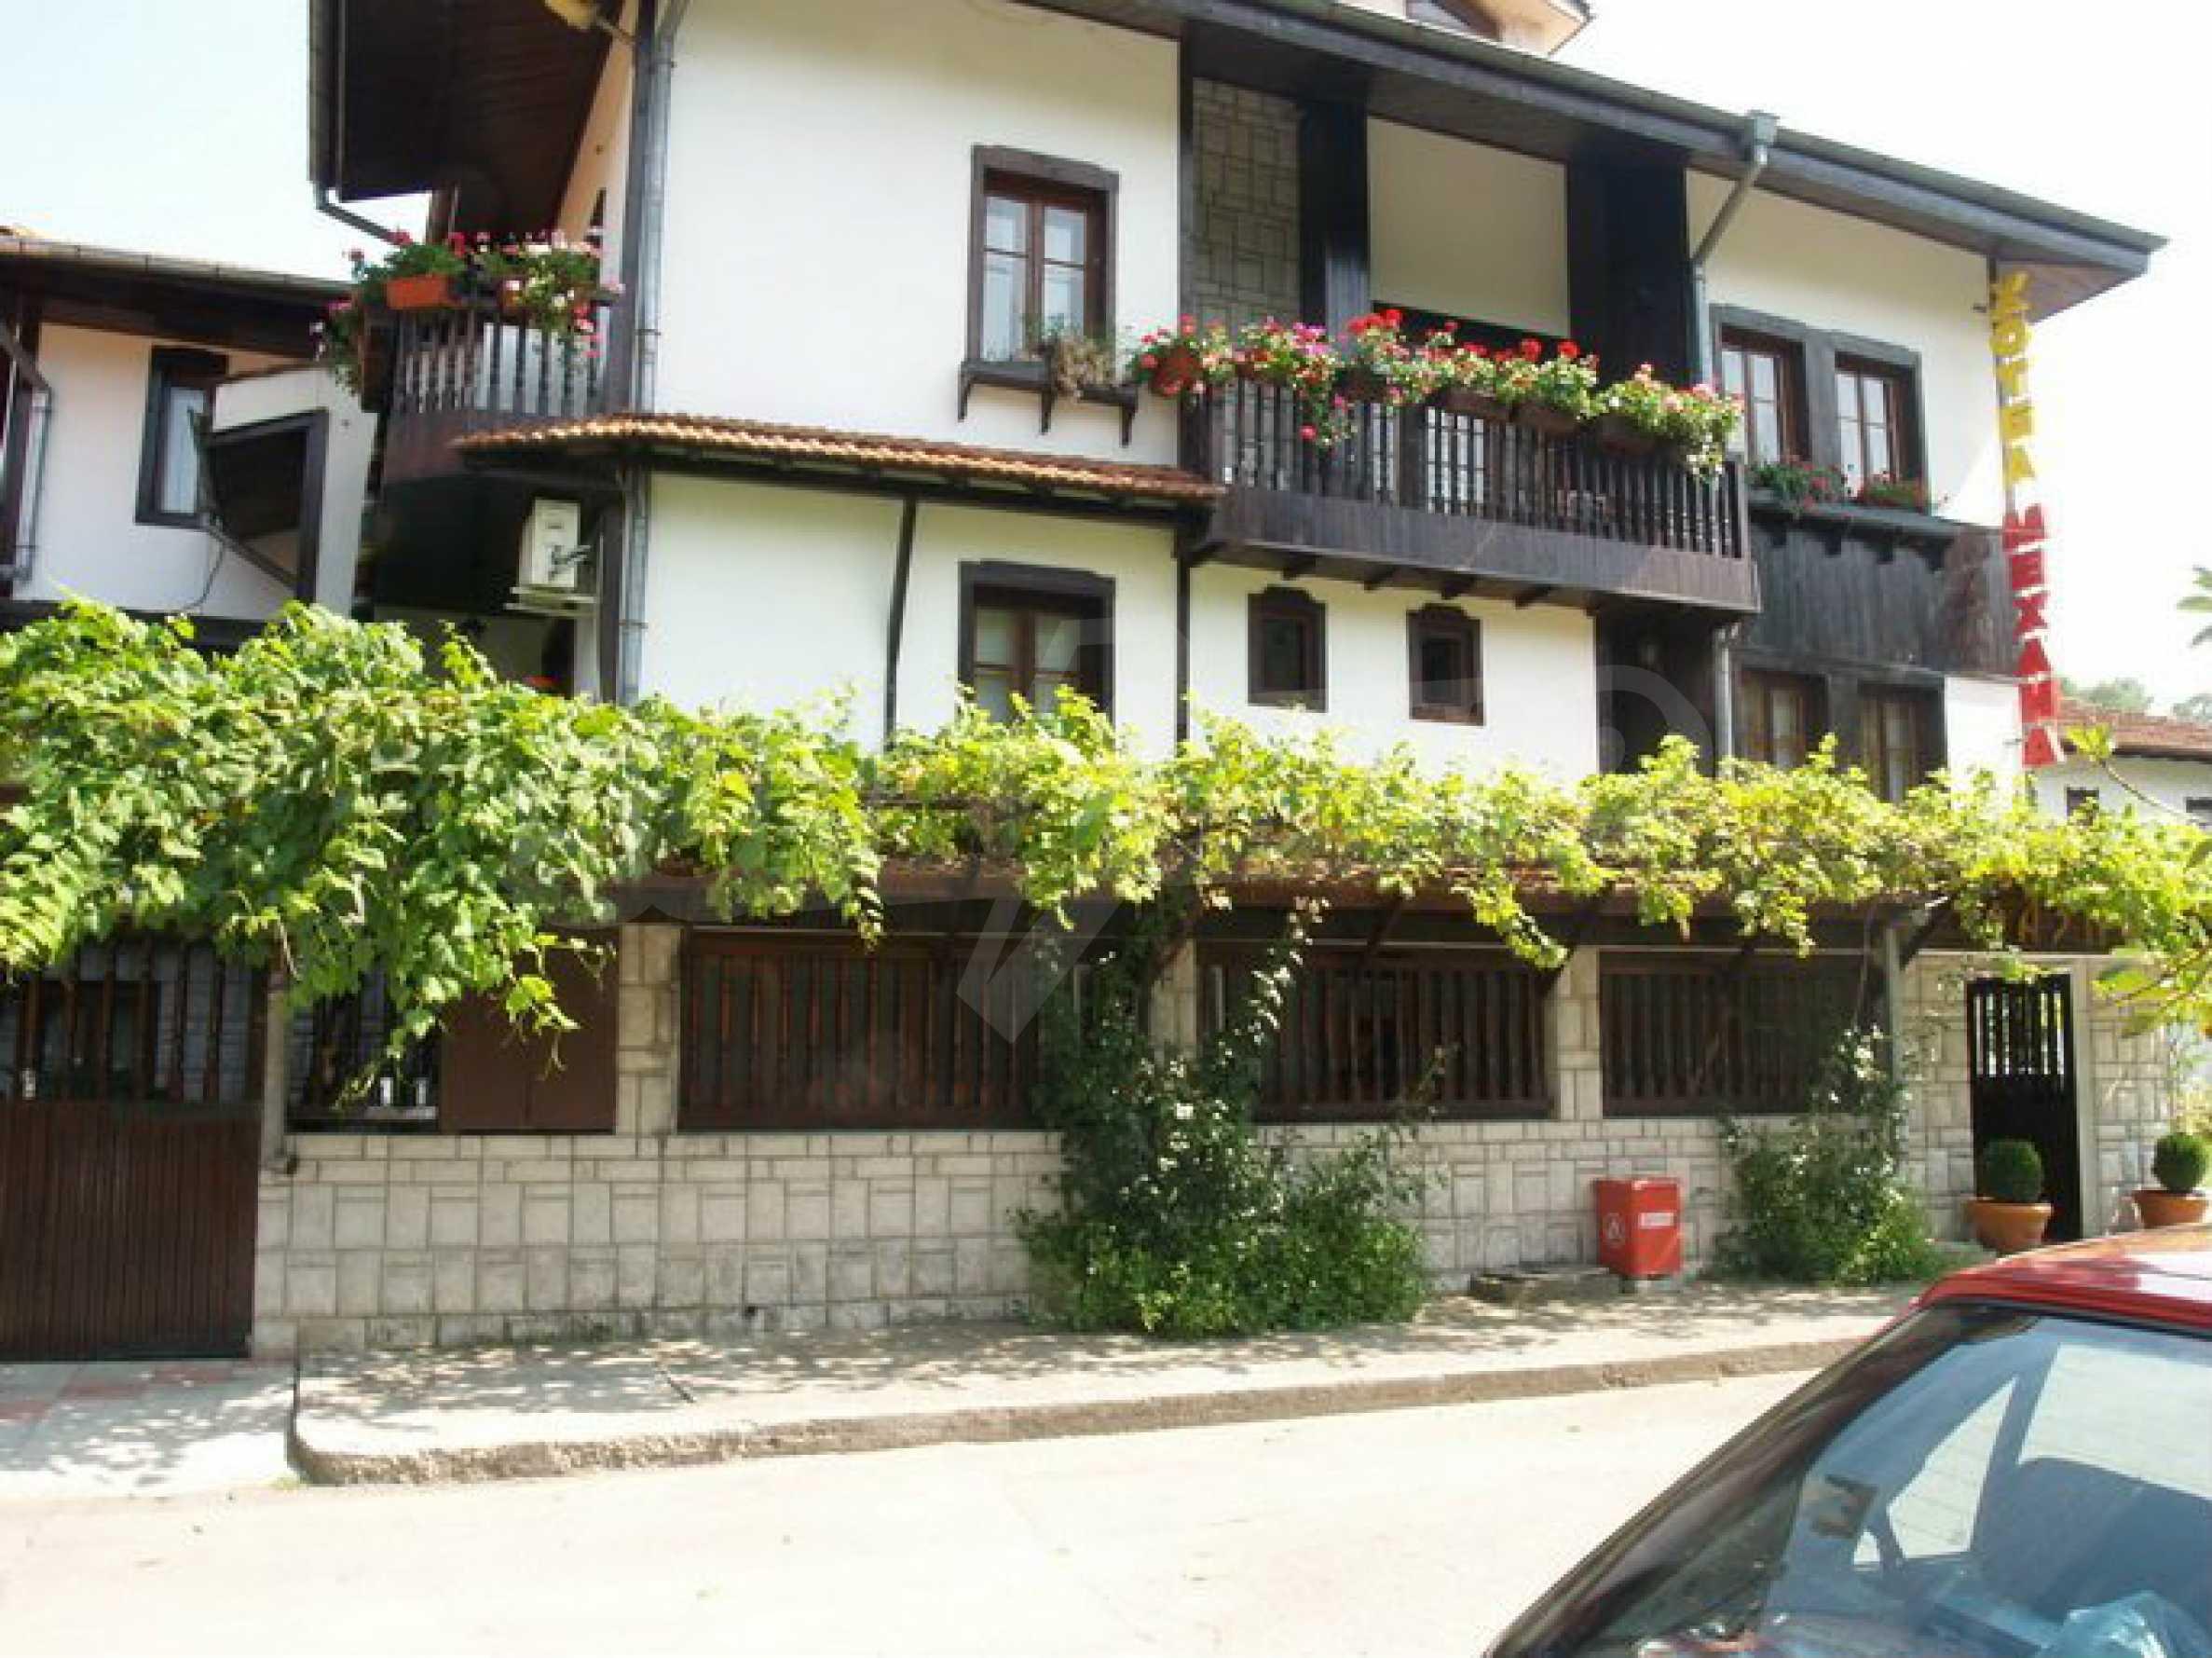 Hotelanlage mit Restaurant am Ufer des Flusses Osam in Lovech 2